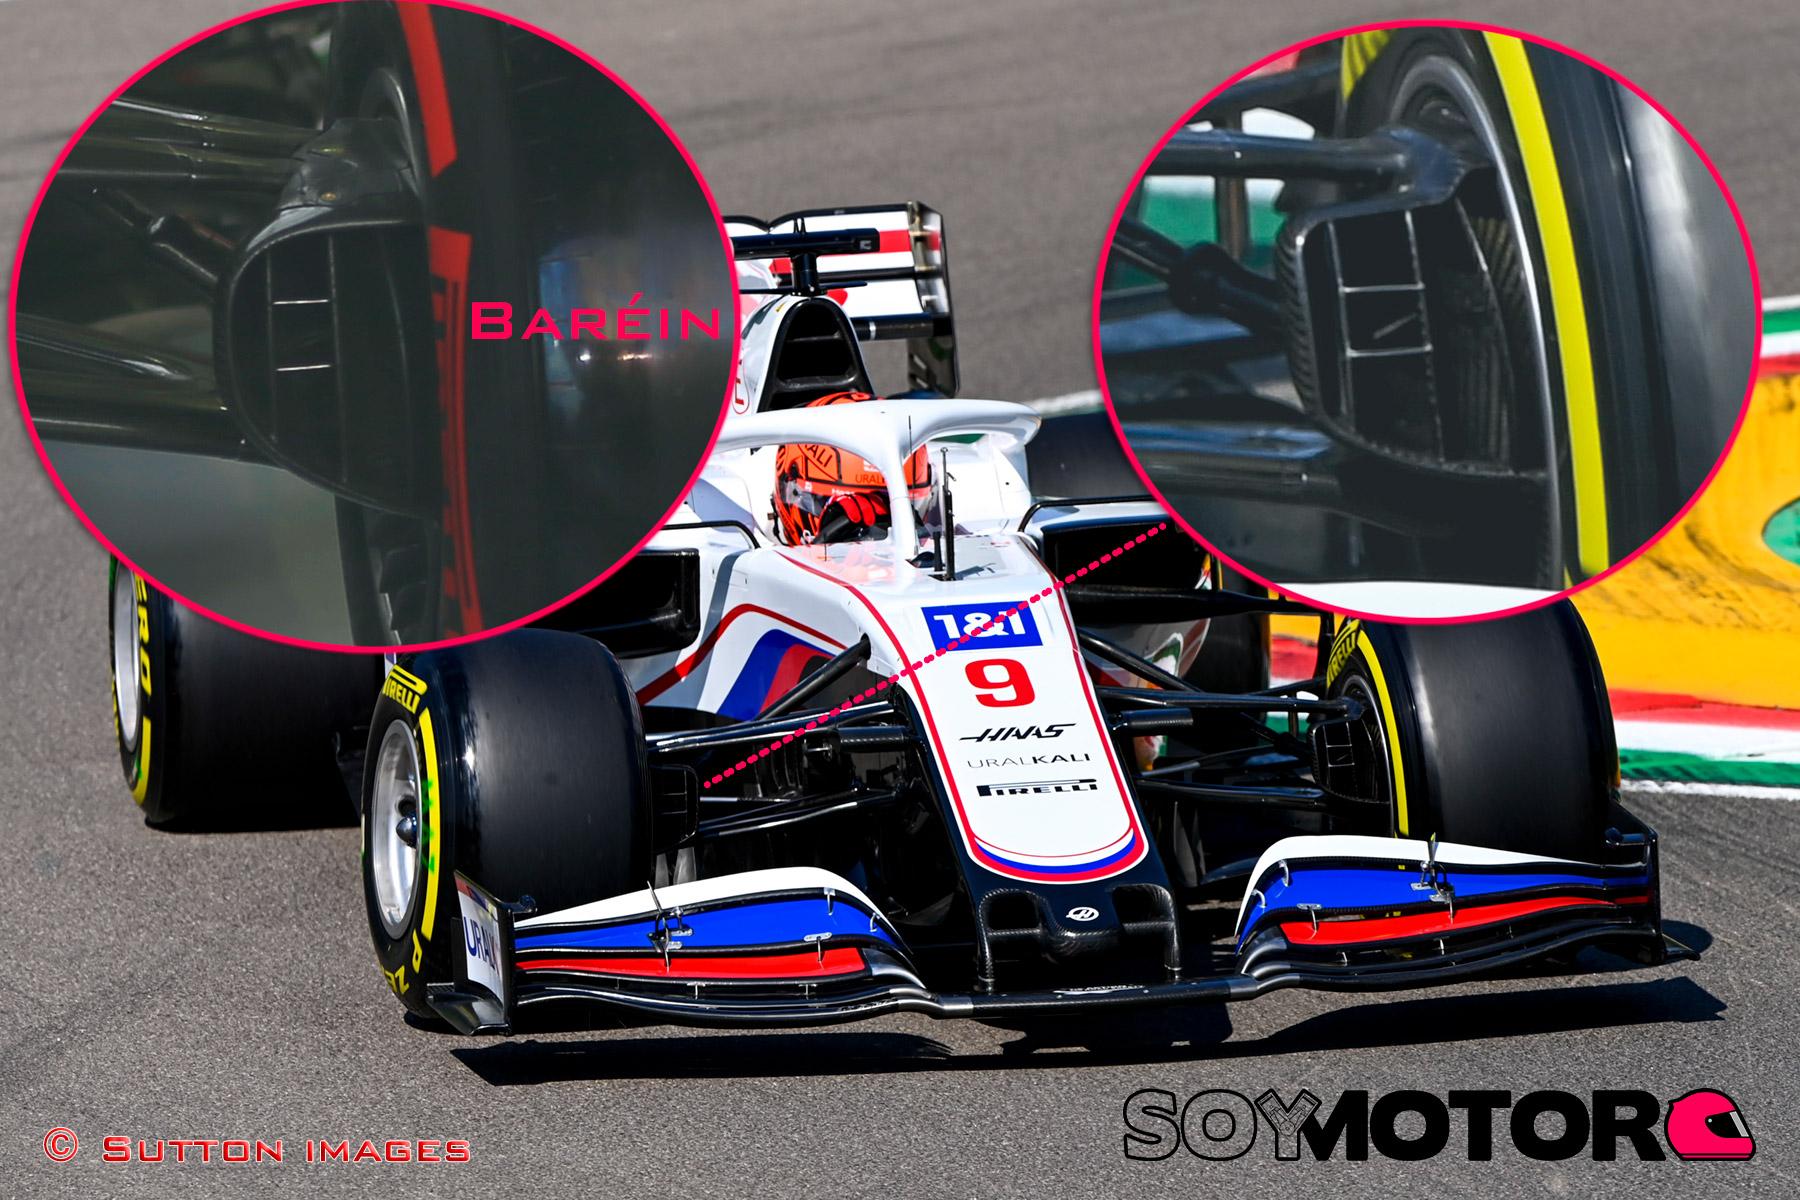 haas-frenos-delanteros-soymotor.jpg